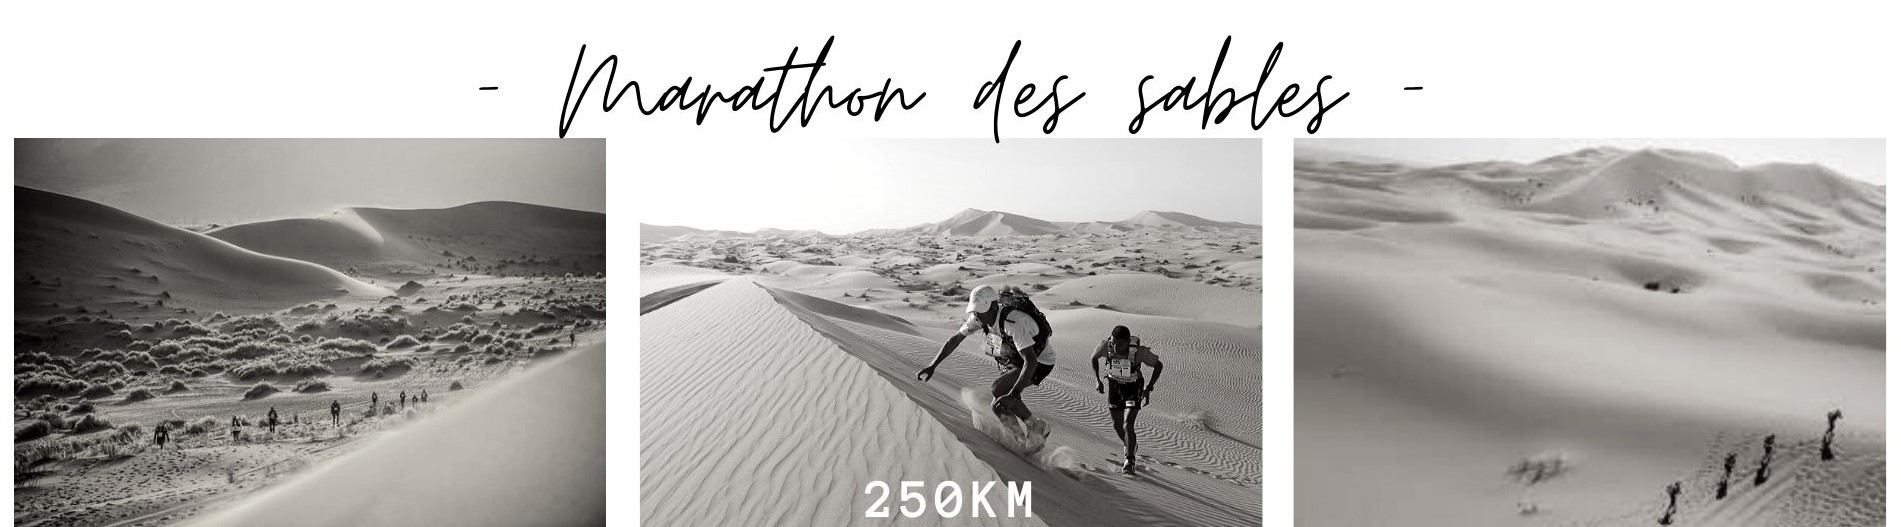 Marathon de sables trail running